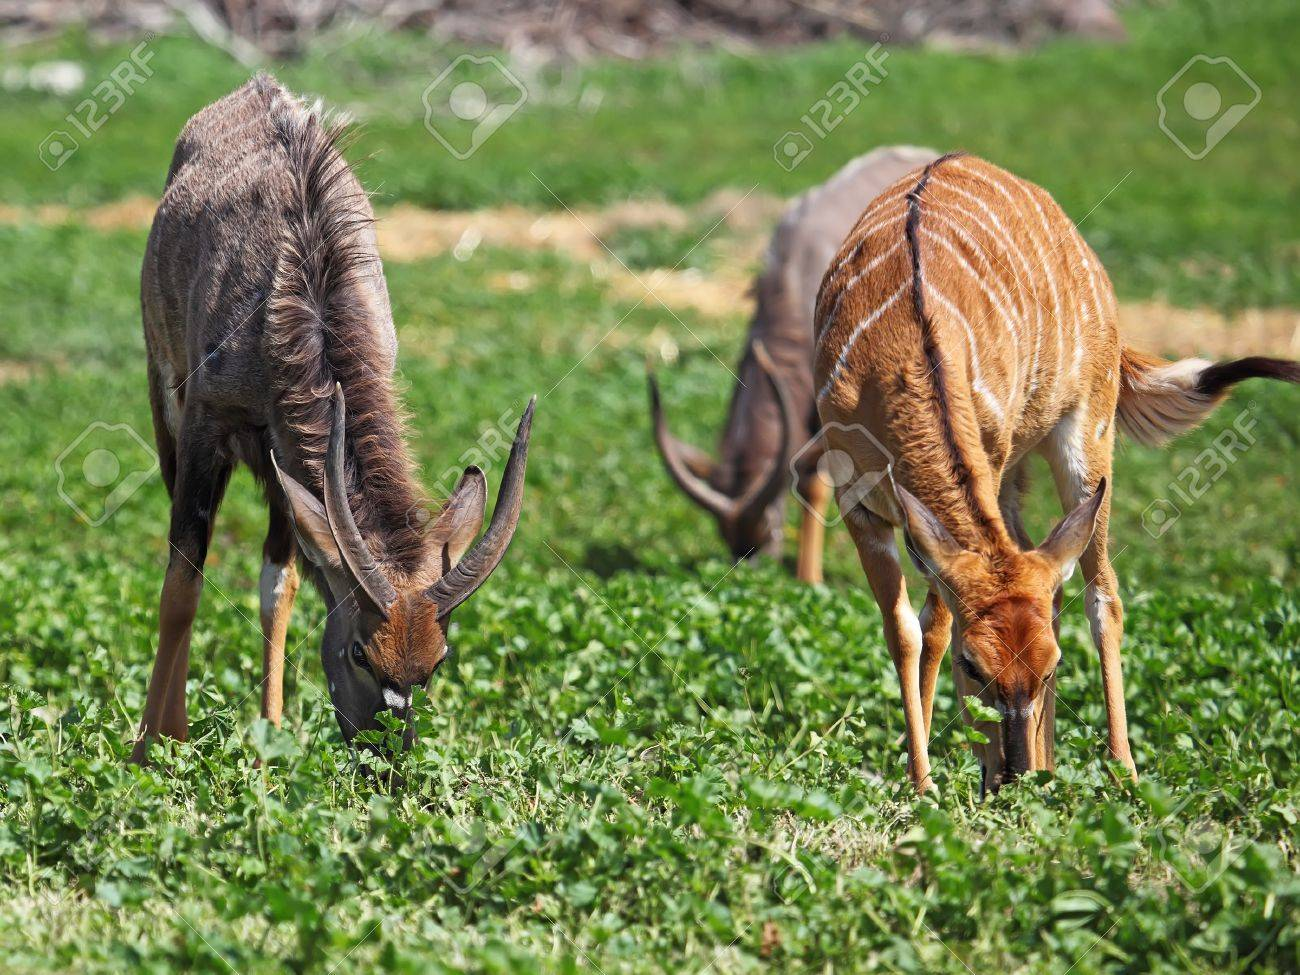 male and female antelope kudu feeding on the grass Stock Photo - 12685291